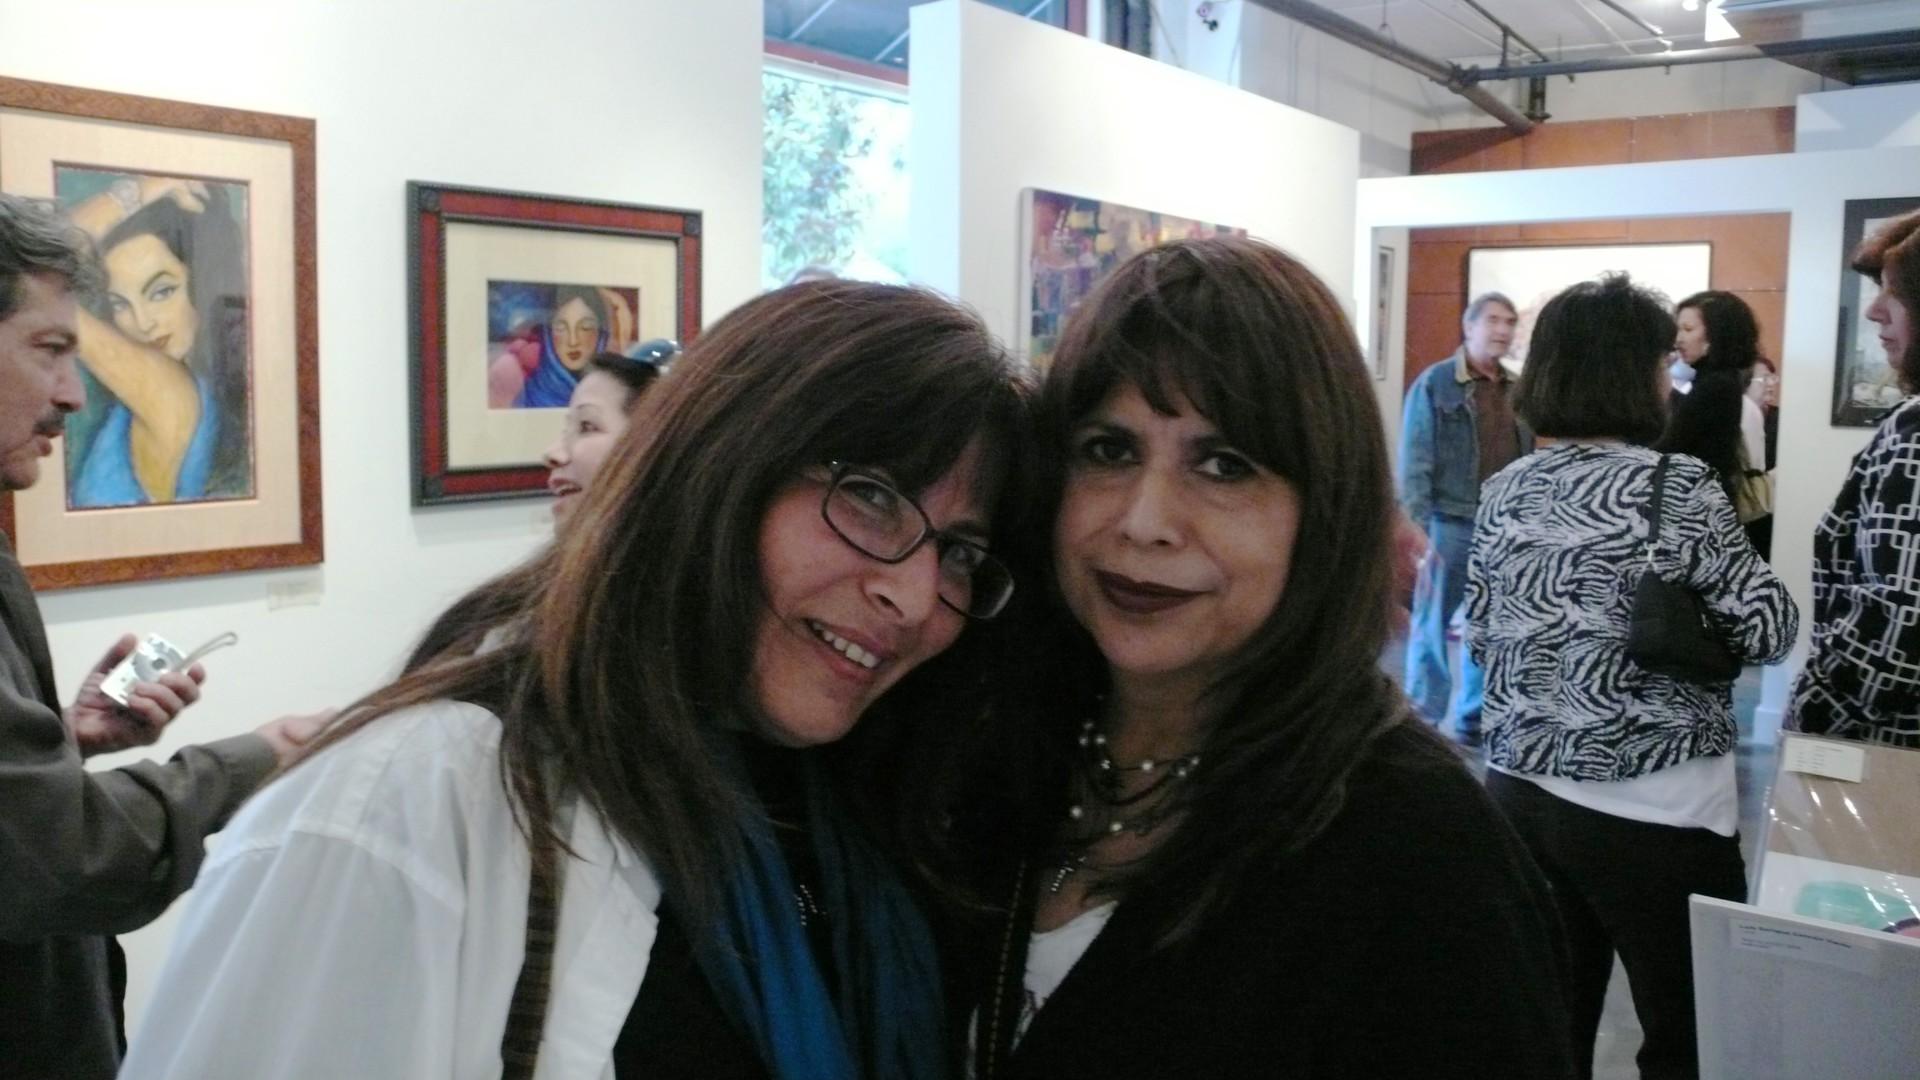 Elsa Flores - Patsy Valdes - Fremont Gallery